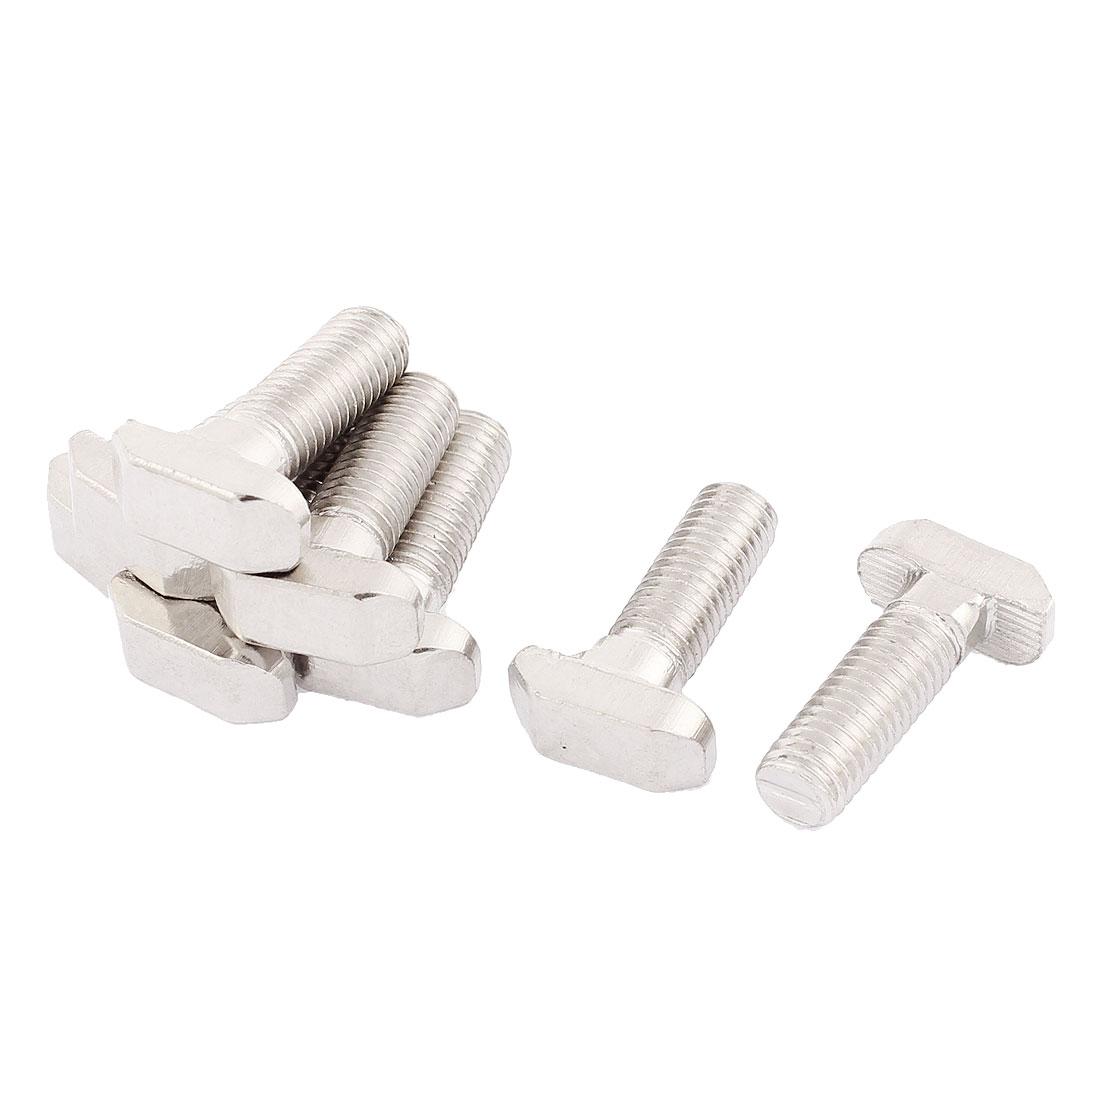 M8 Thread Metal T-Slot Drop-In Stud Sliding Screw Bolt Silver Tone 8pcs